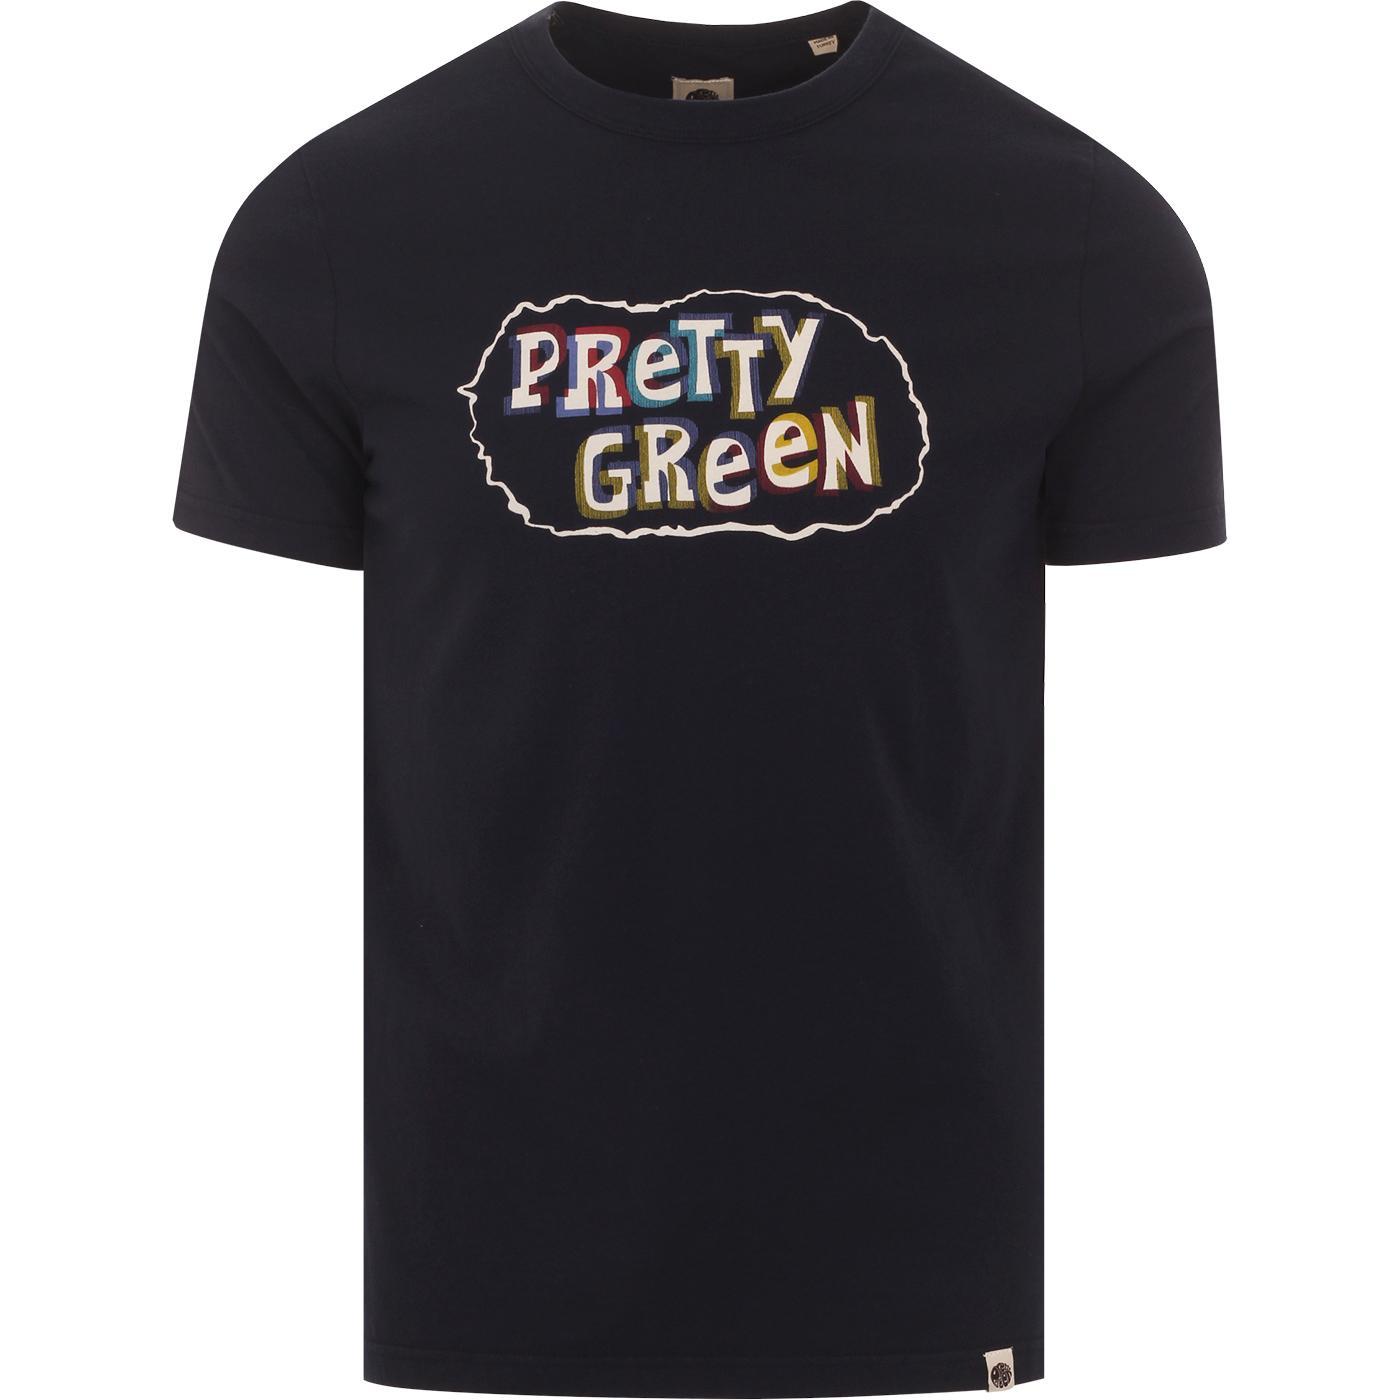 PRETTY GREEN Retro 1950s 3D Logo Print Tee